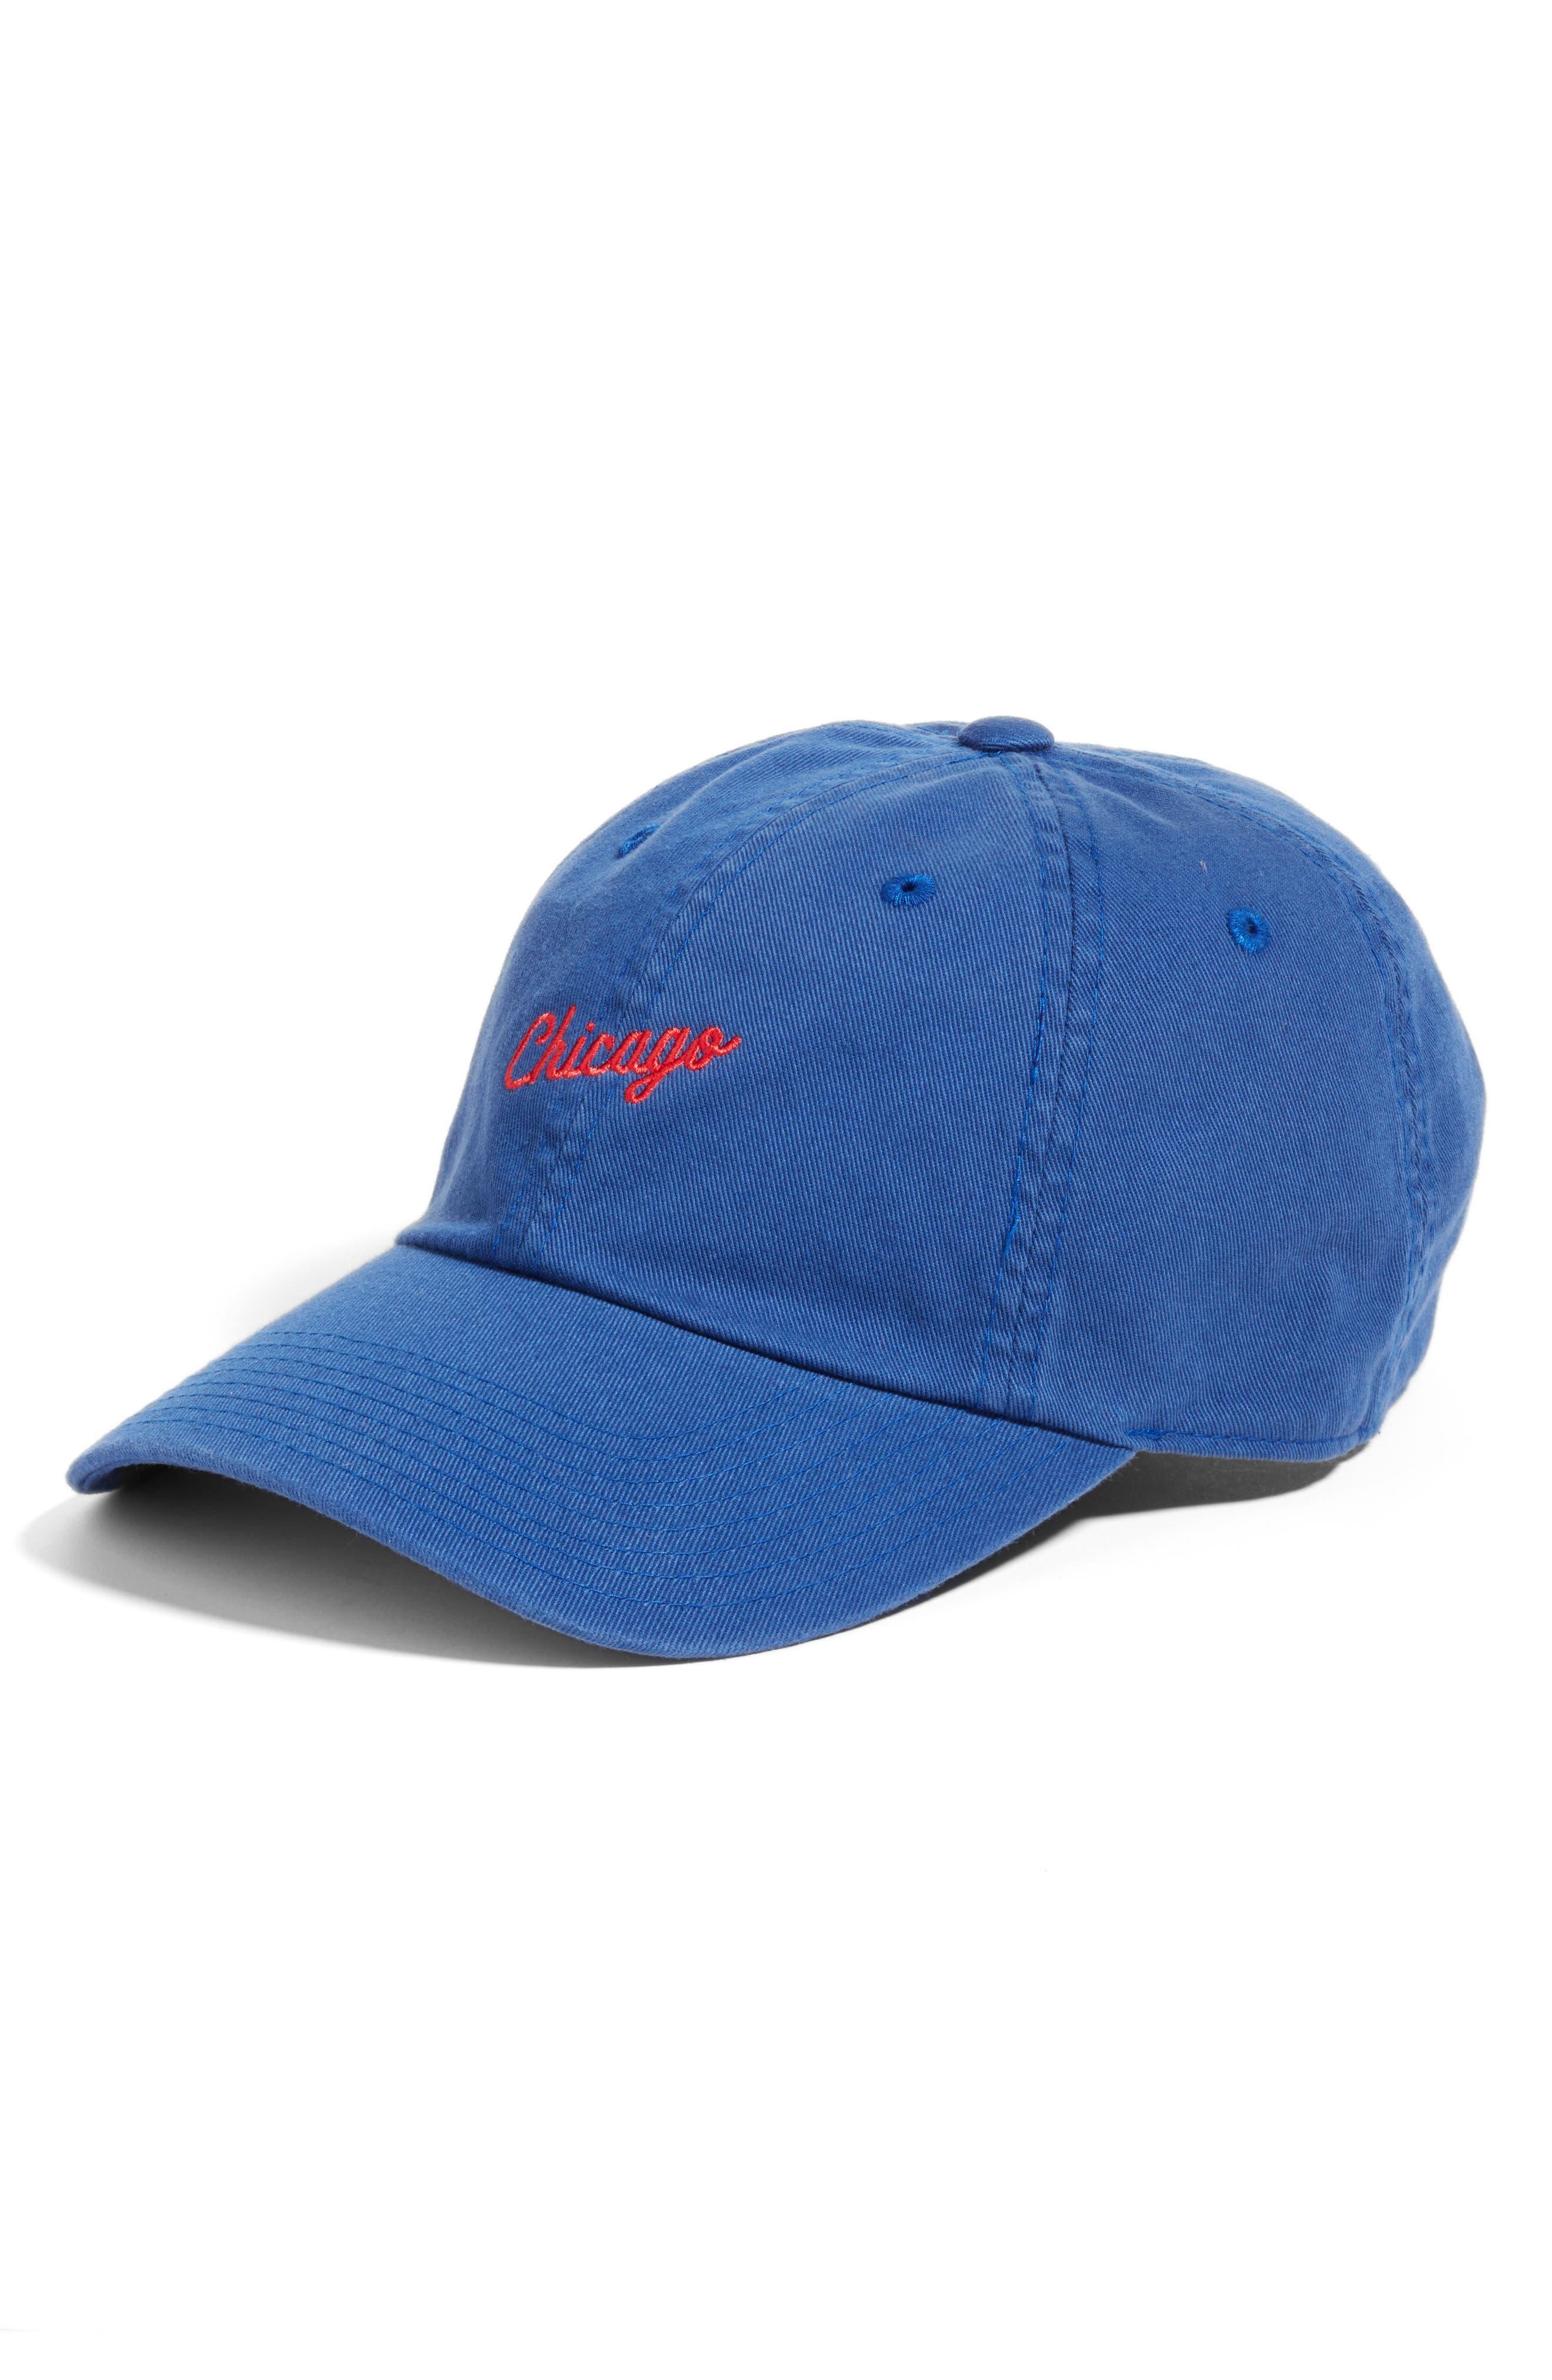 Boardshort - Chicago Baseball Cap,                         Main,                         color, Bay Blue